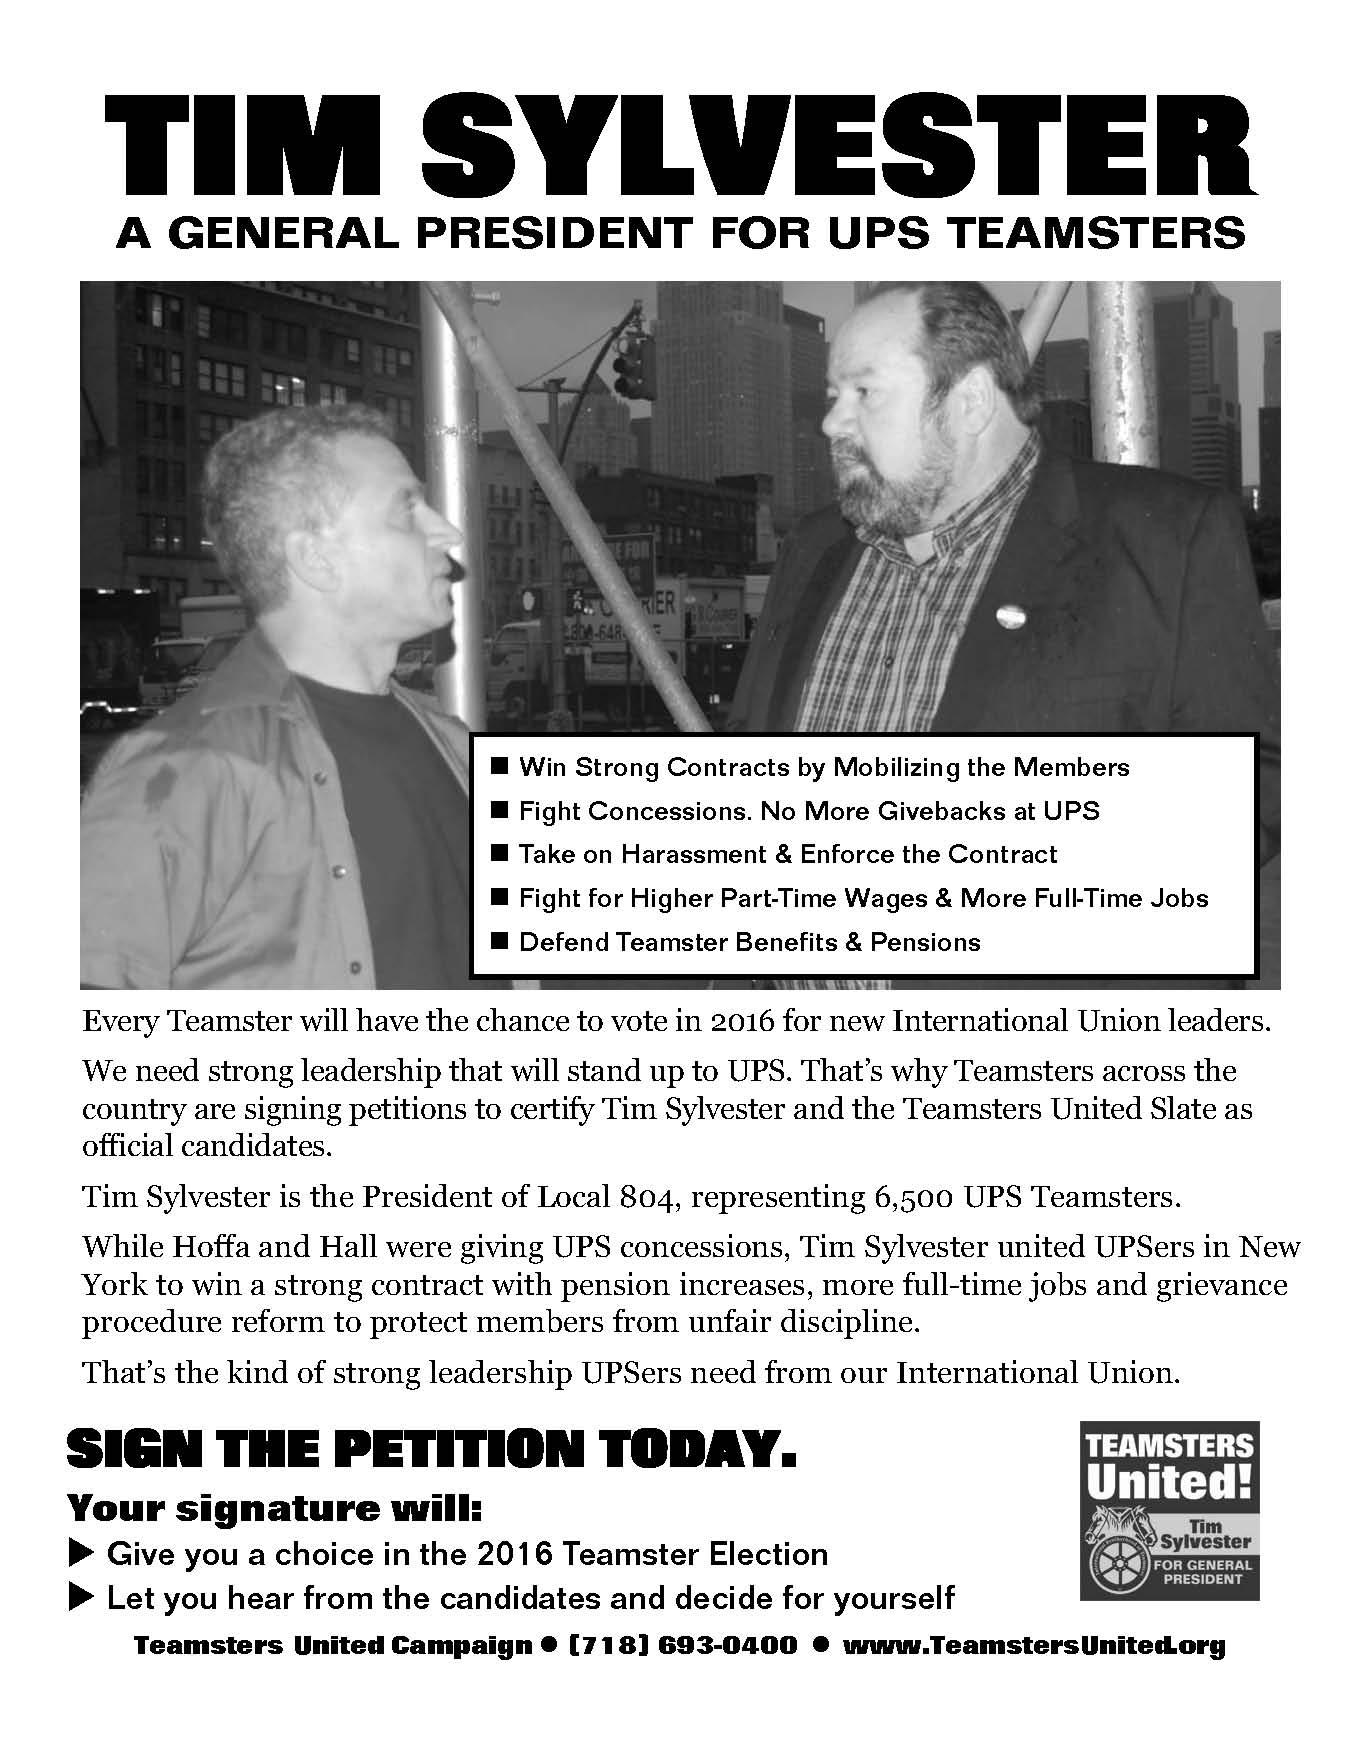 petition-leaflet-ups.jpg